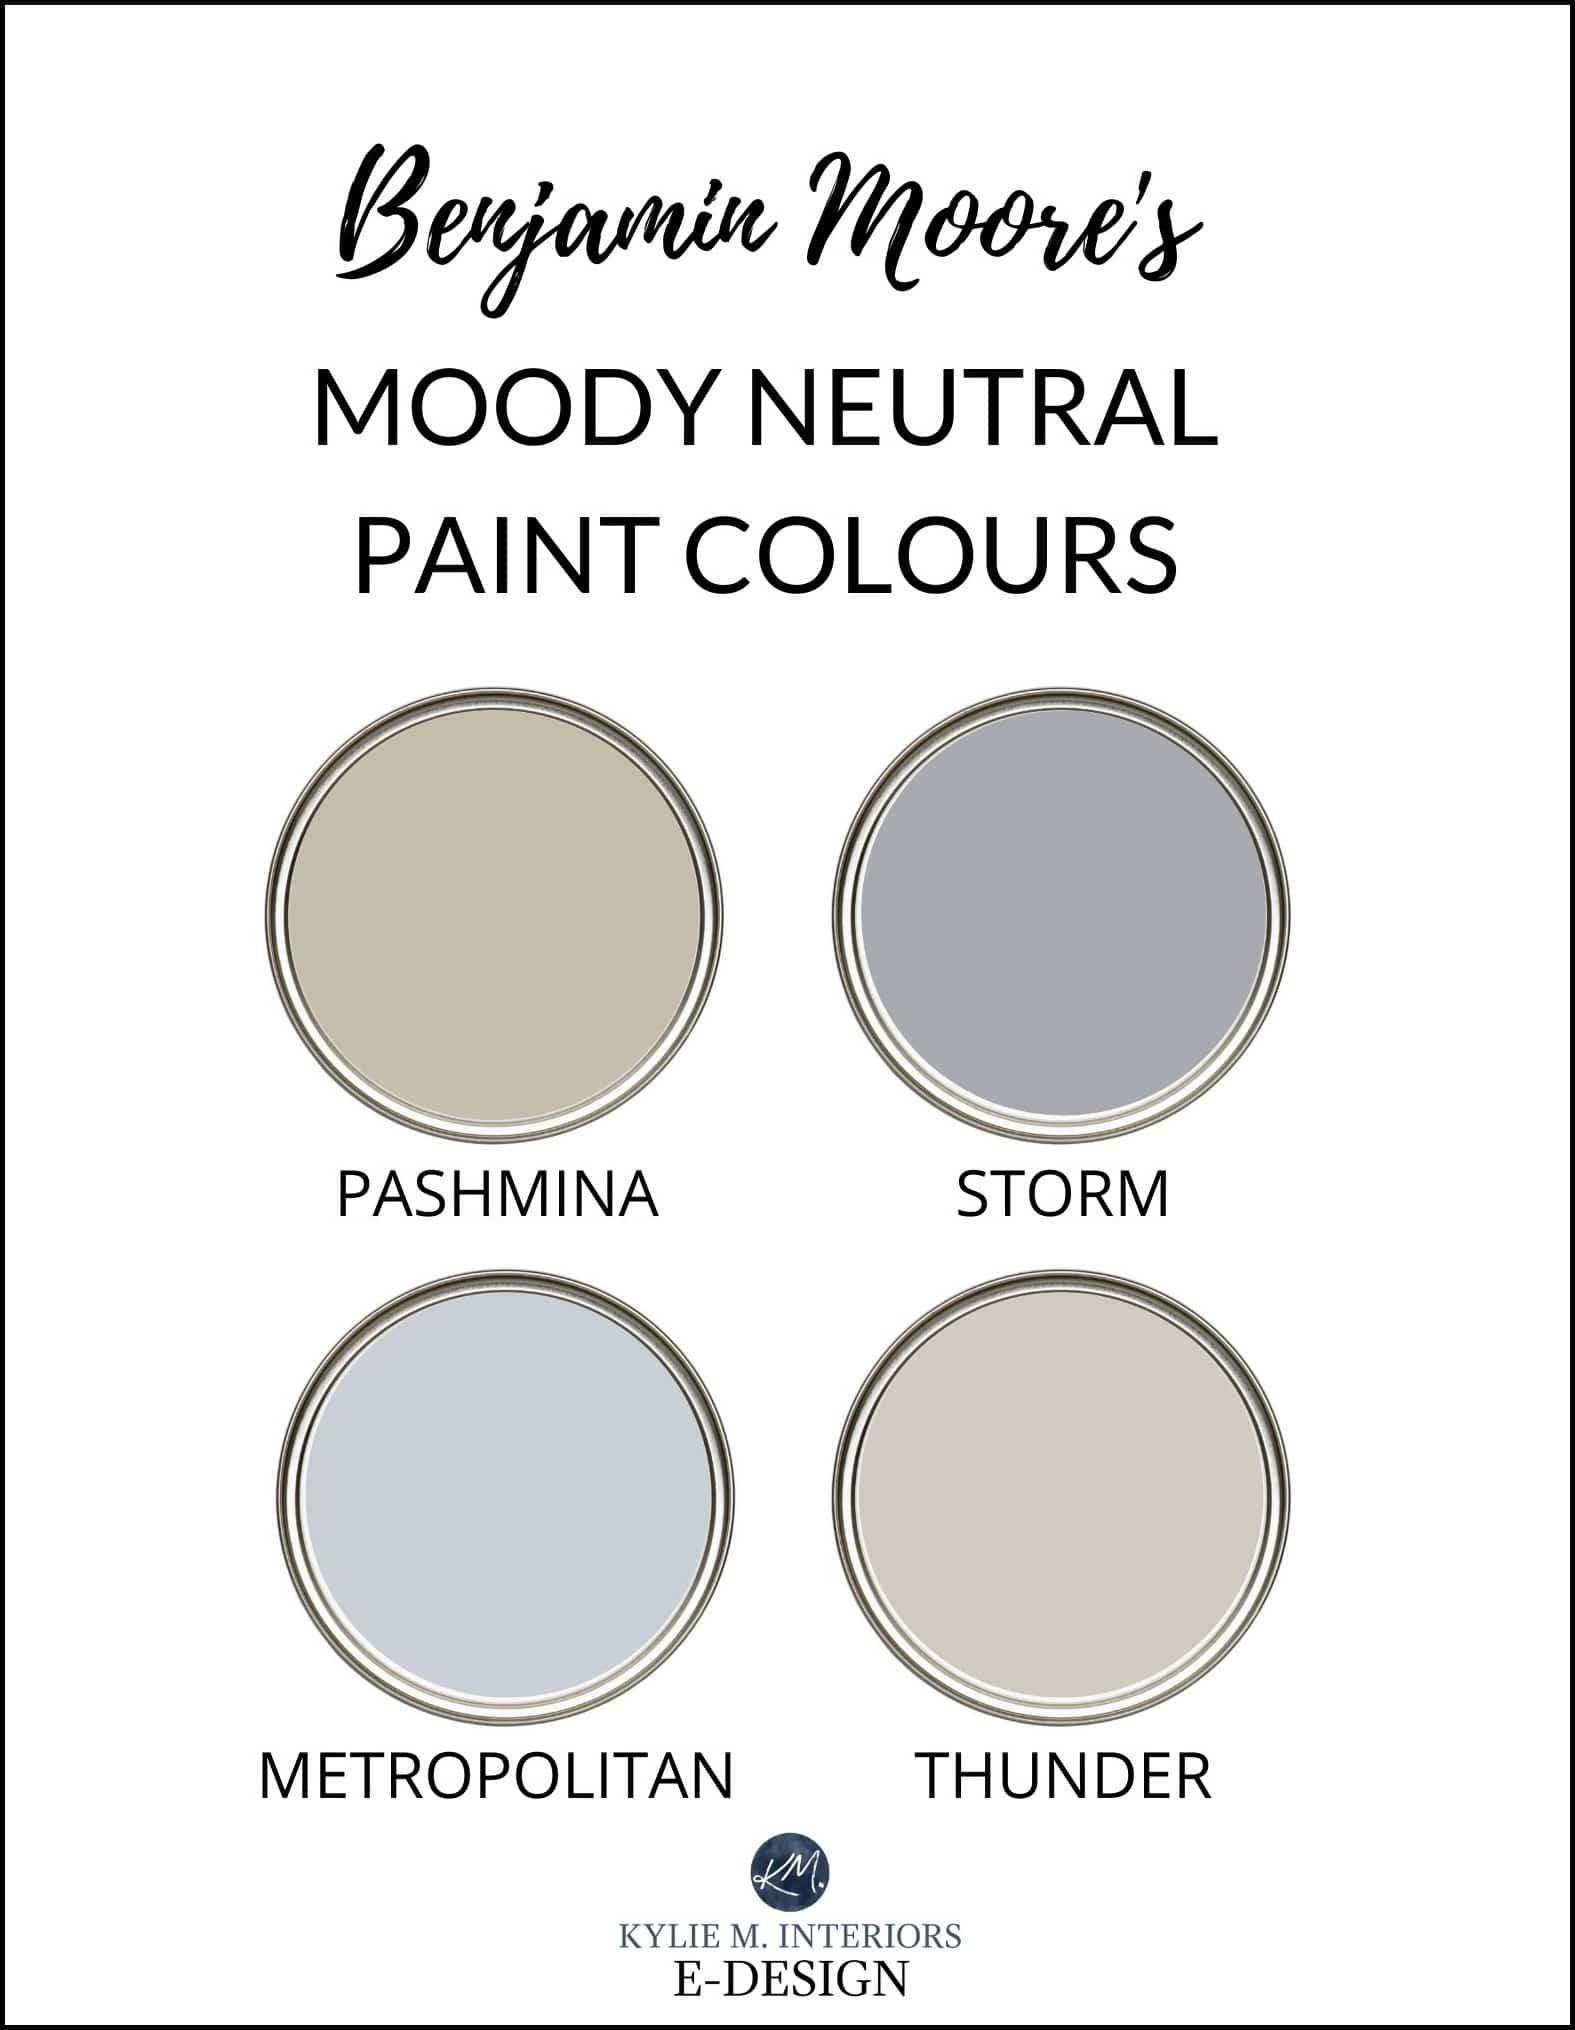 The best Benjamin Moore Affinity paint colours, Pashmina, Storm, Weimaraner, Metropolitan, Kangaroo, Thunder. Review by Kylie M Interiors Edesign, diy decor blogger